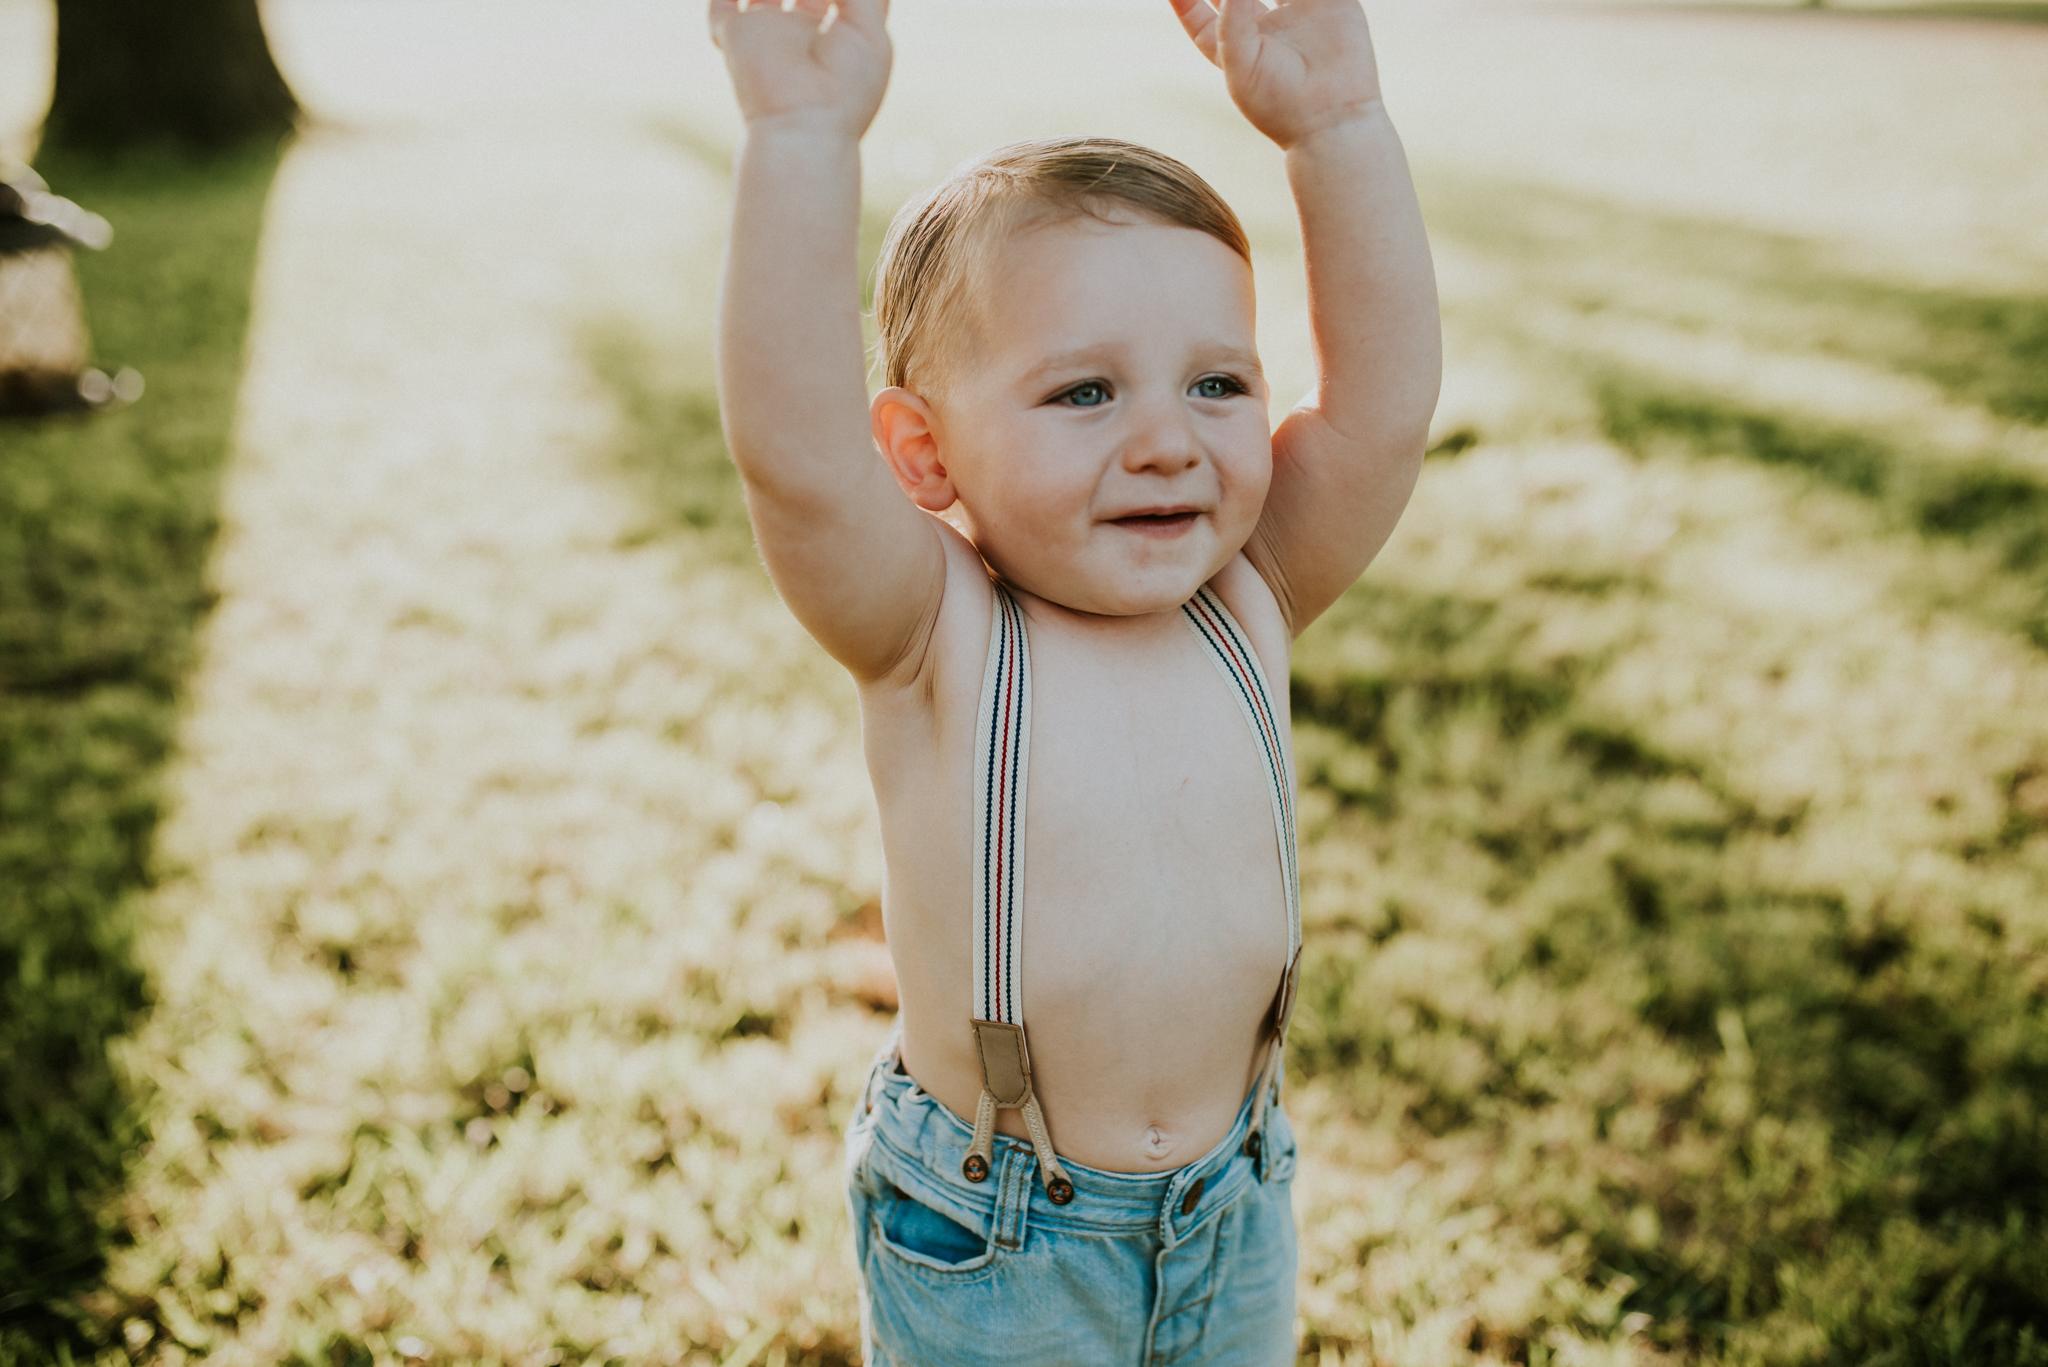 Graham-18 months-10.jpg